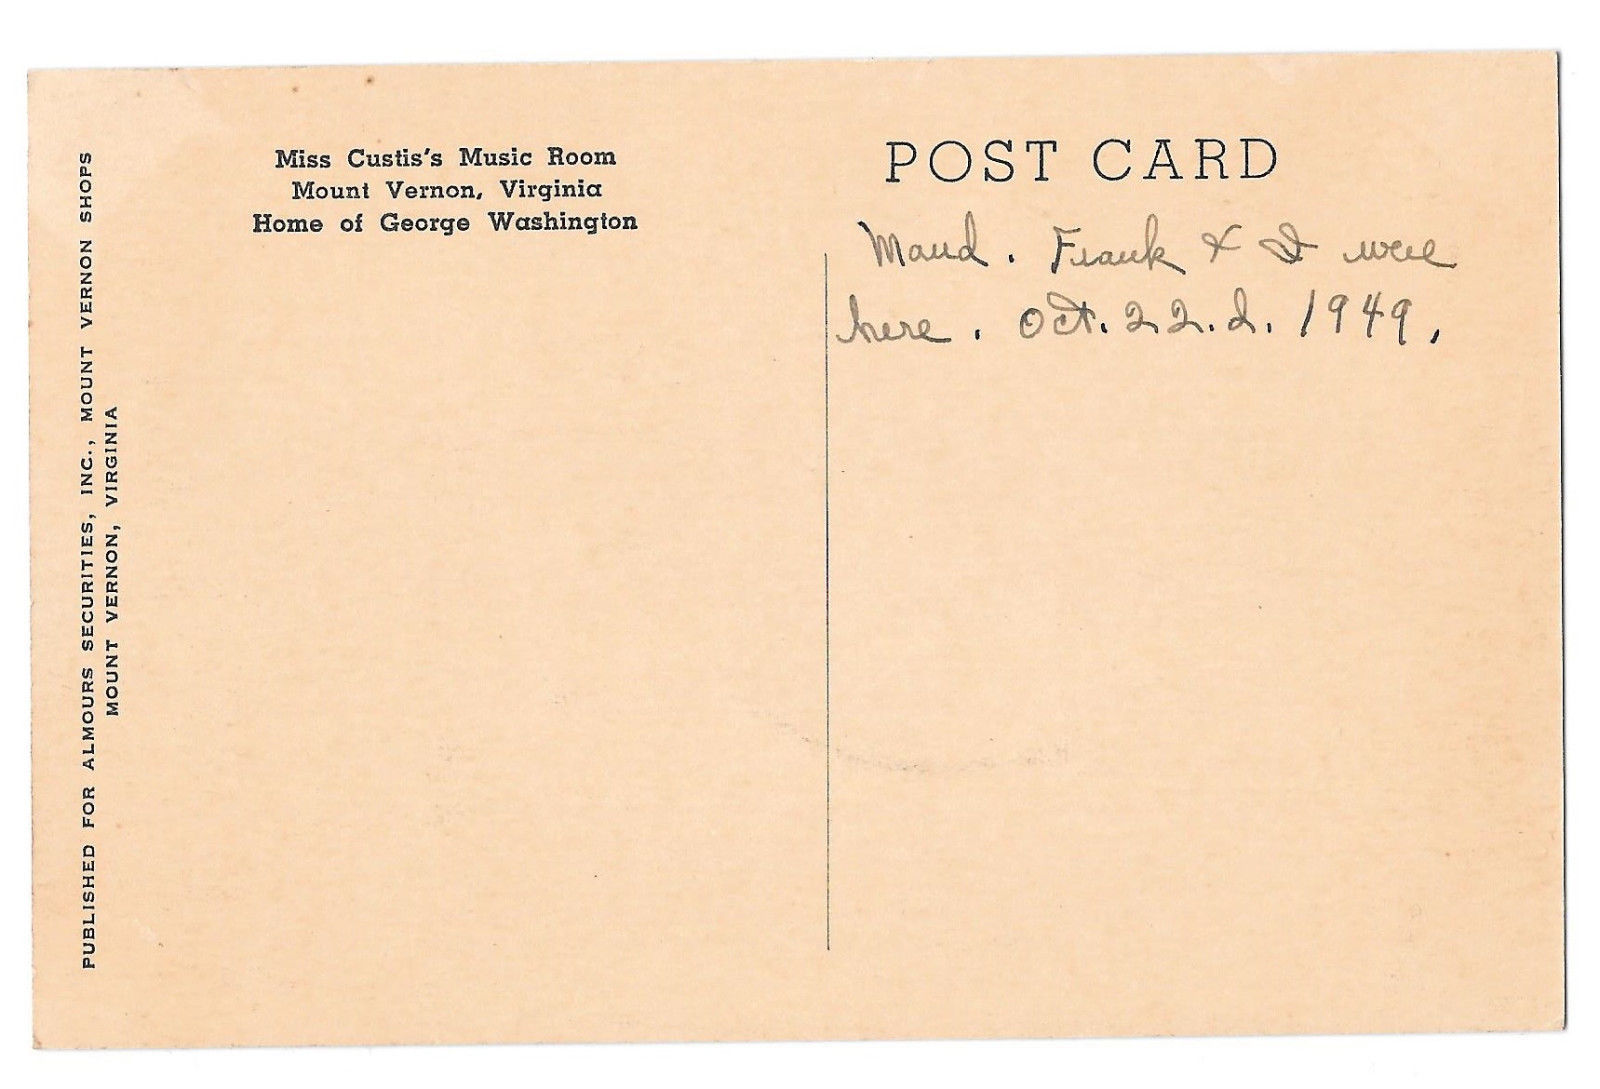 VA Mount Vernon Shops Miss Custis Music Room Vtg Almours Securities Postcard